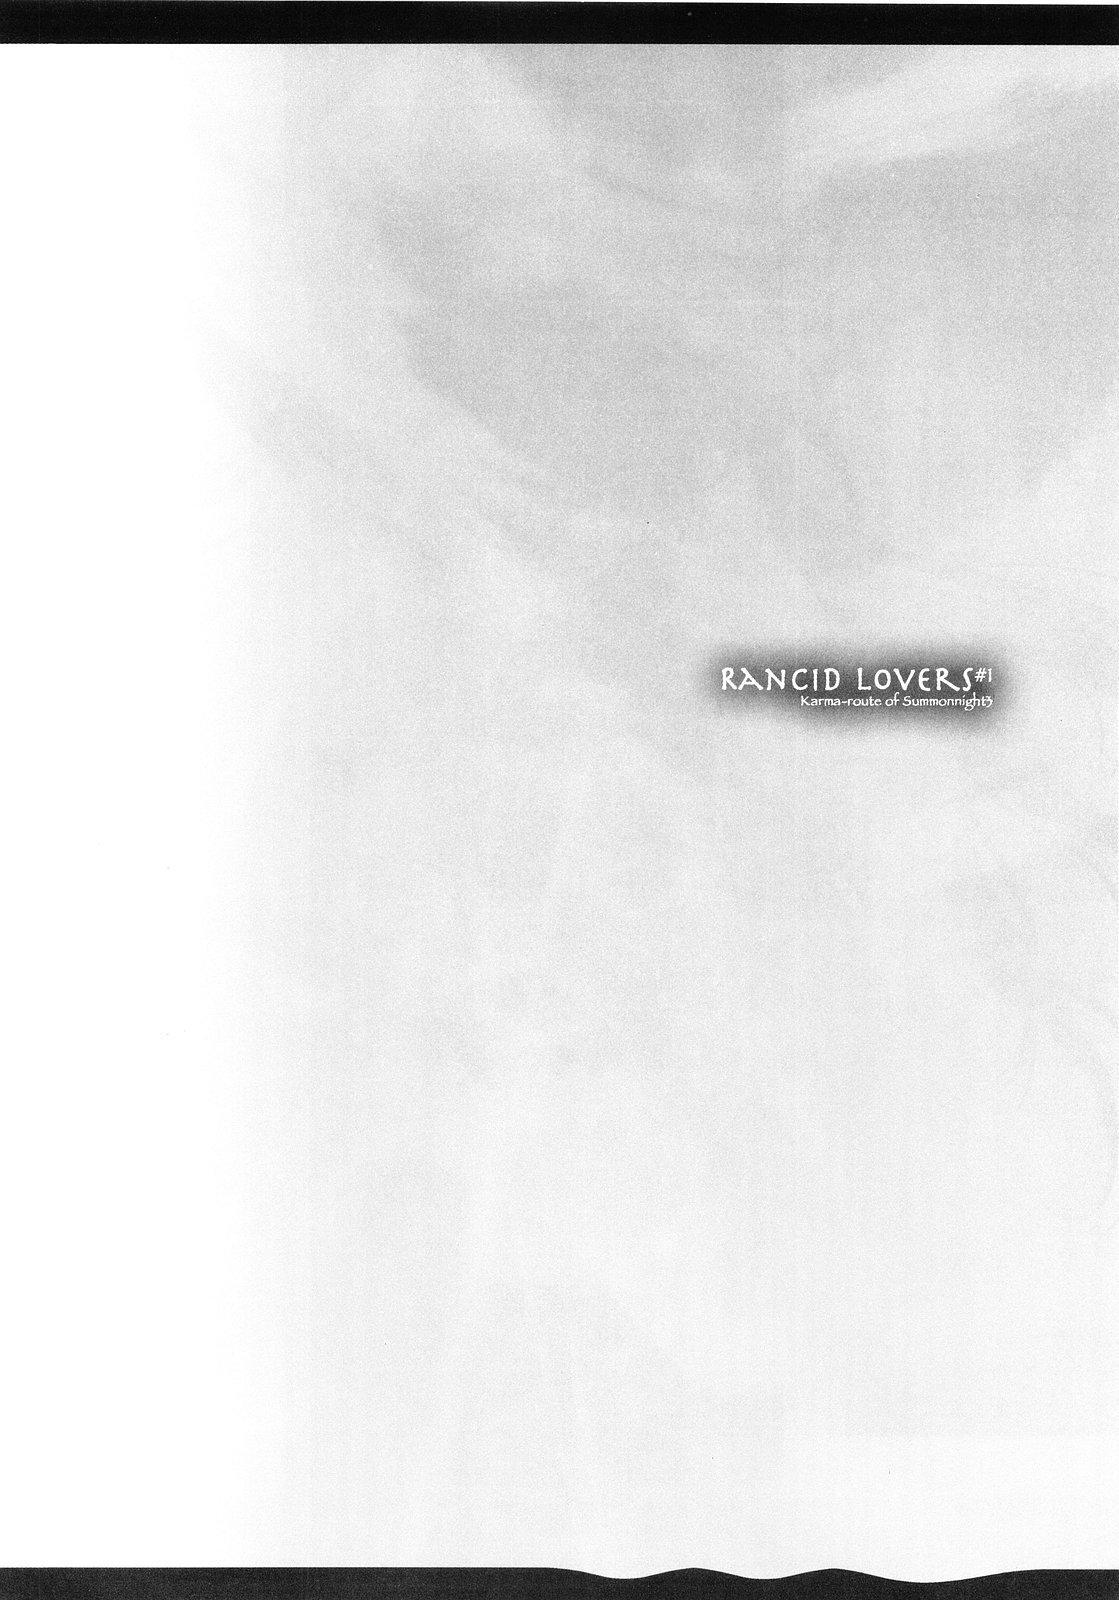 Rancid Lovers #1 2